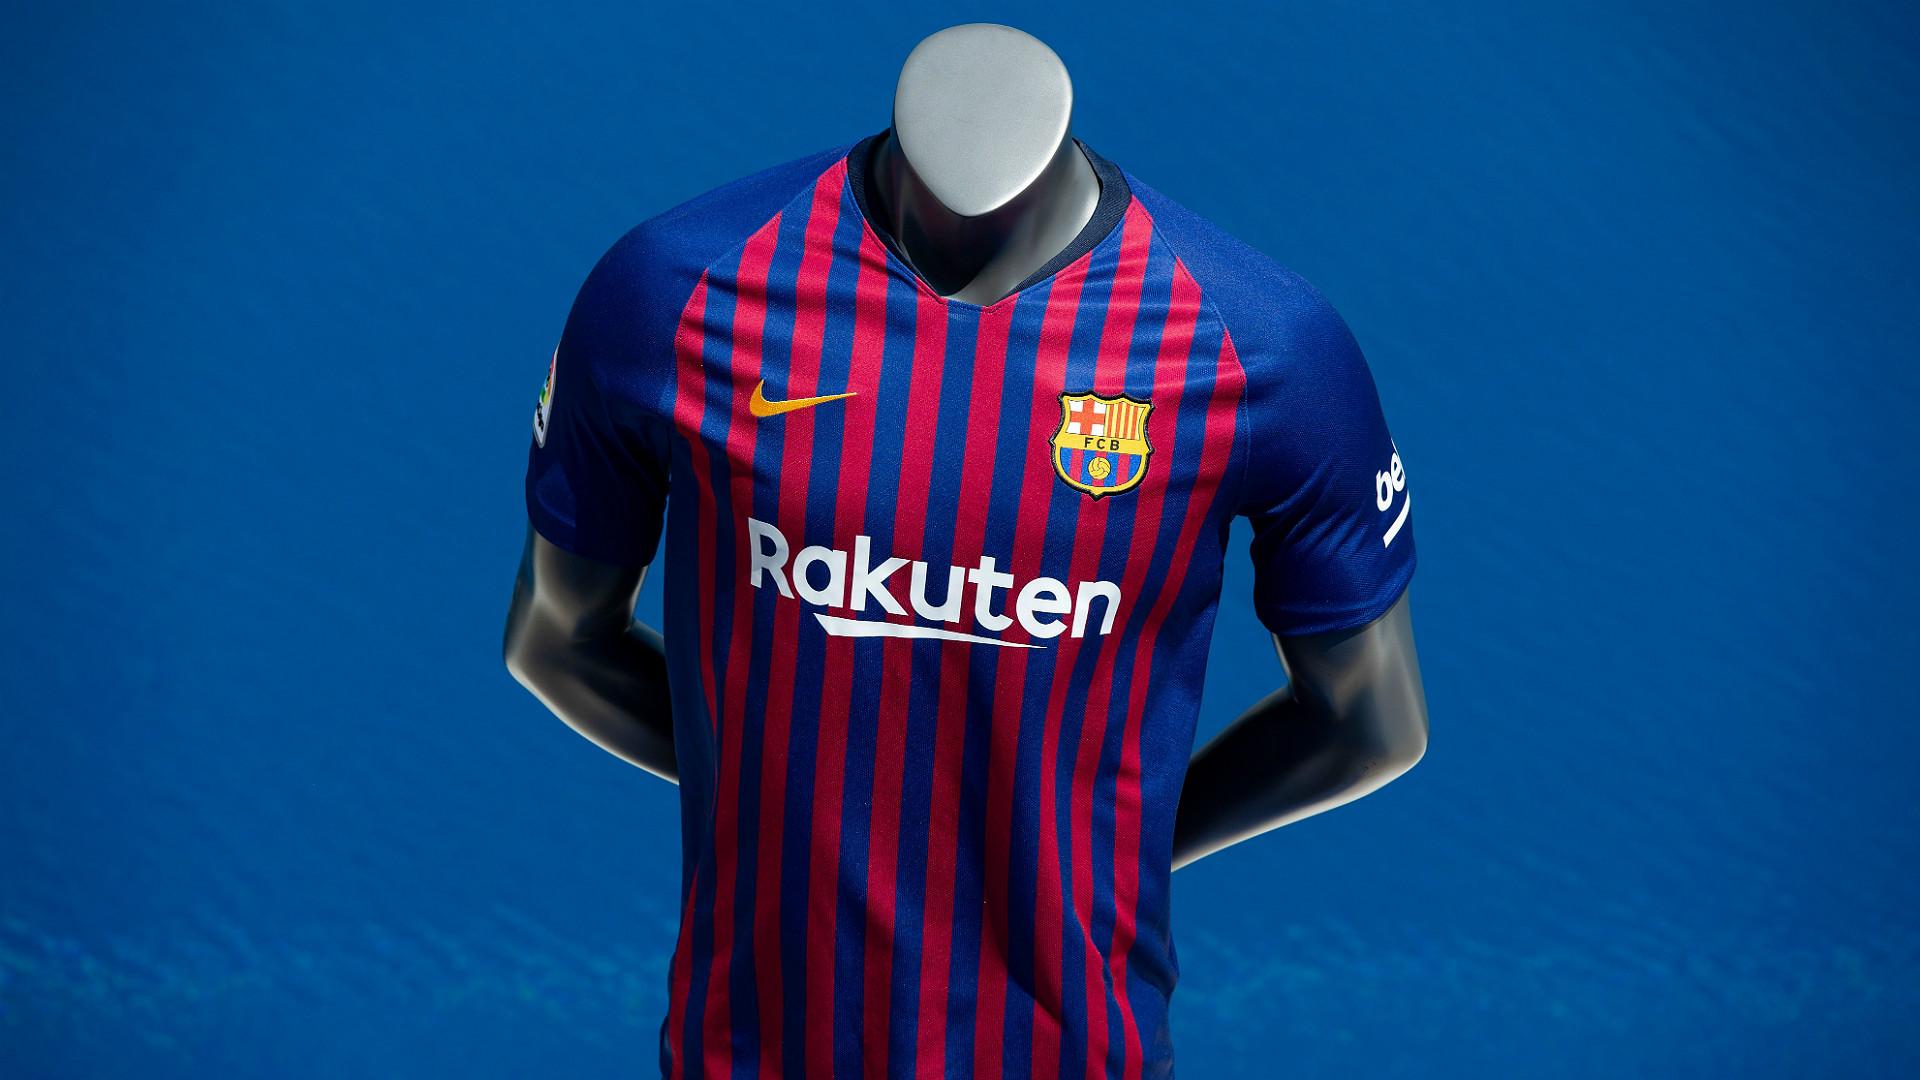 comprar camiseta Barcelona hombre